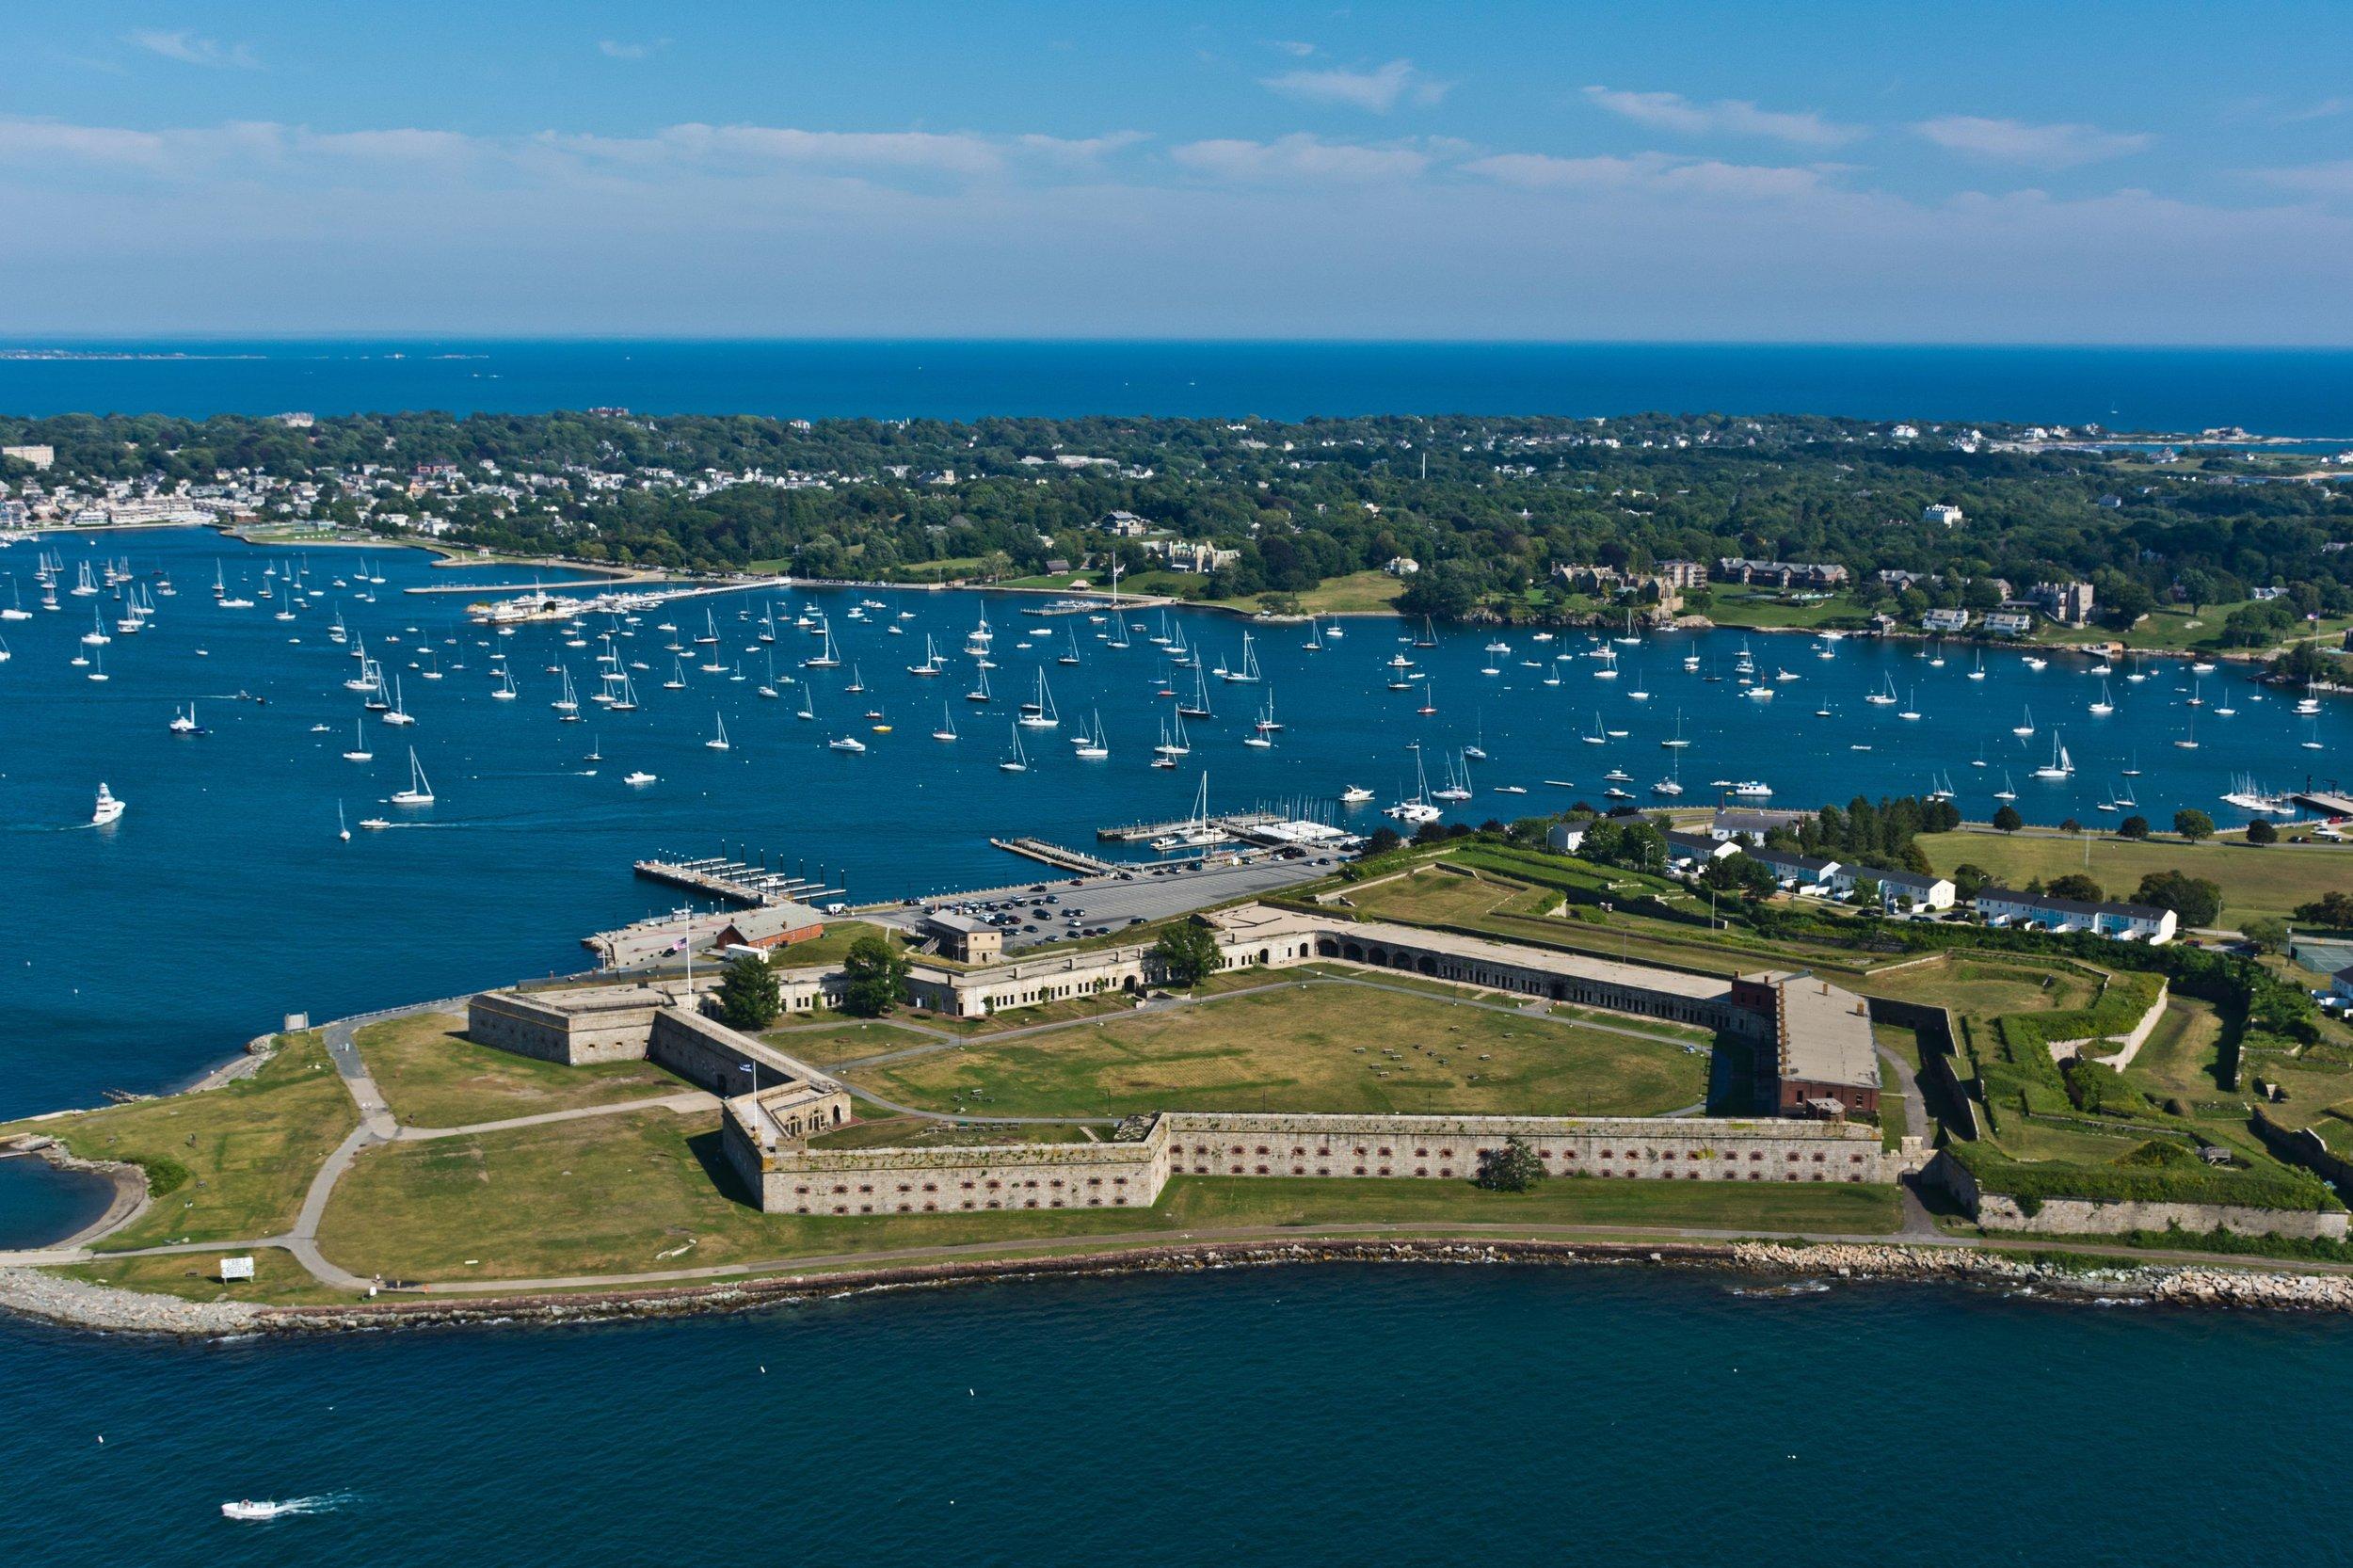 fort-adams-state-park-807920538-5b3007e3eb97de0036f8fdaa.jpg